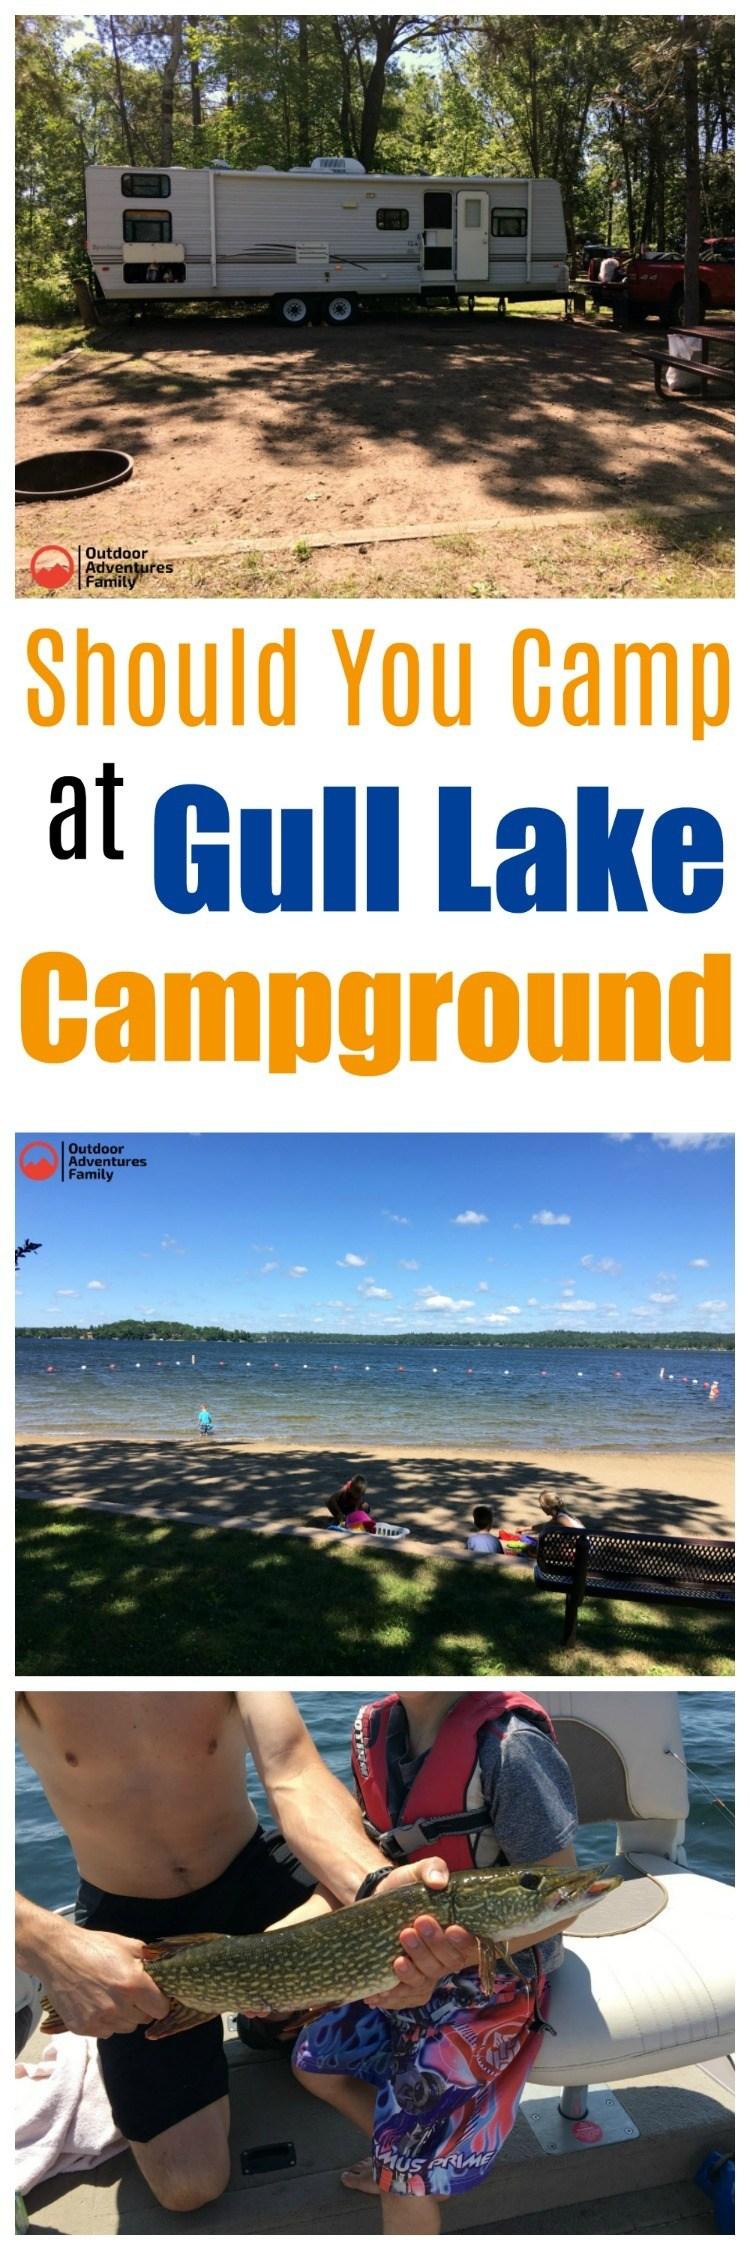 should you camp at Gull Lake campground